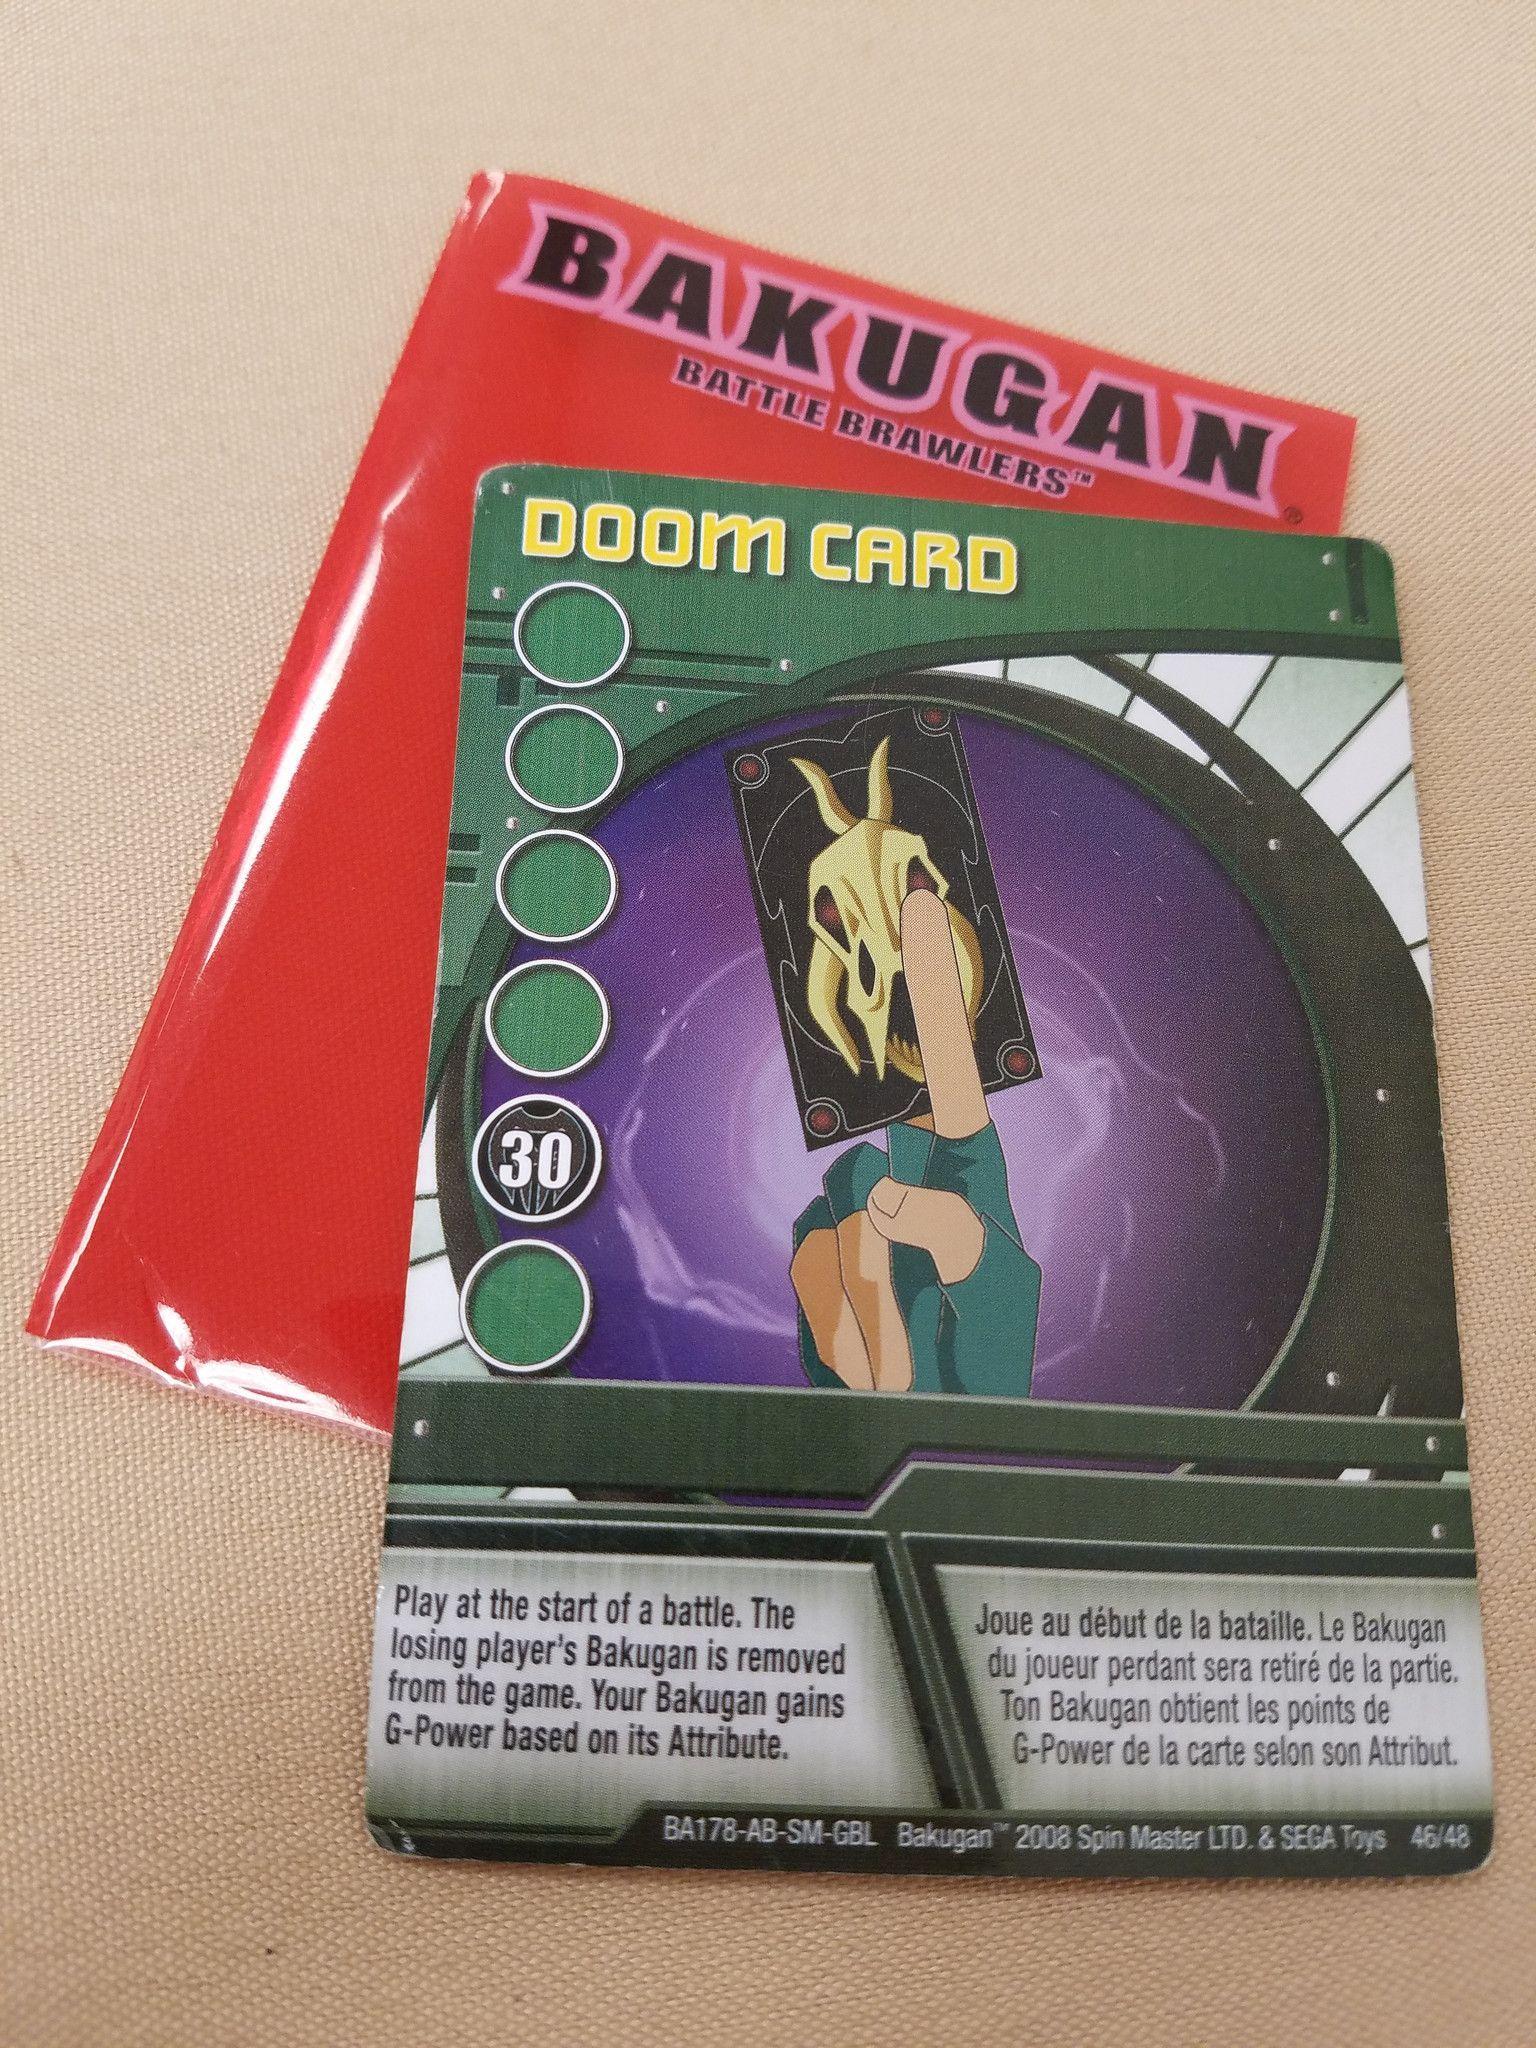 Bakugan Doom Card Battle Brawlers Bakugan Playing Card In